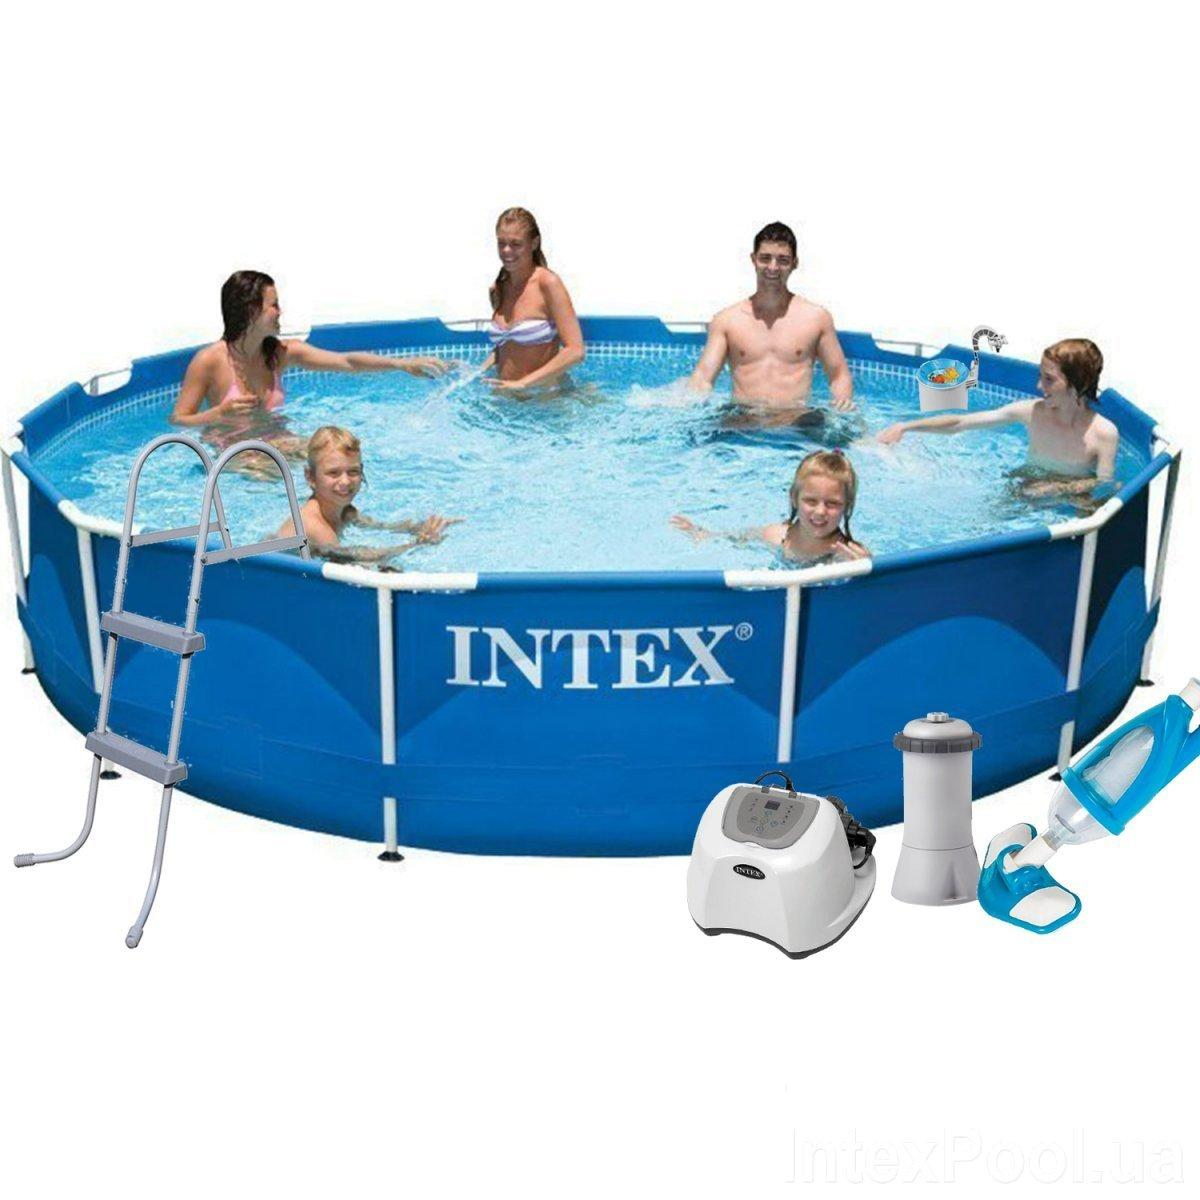 Каркасный бассейн Intex 28210 - 7, 366 x 76 см